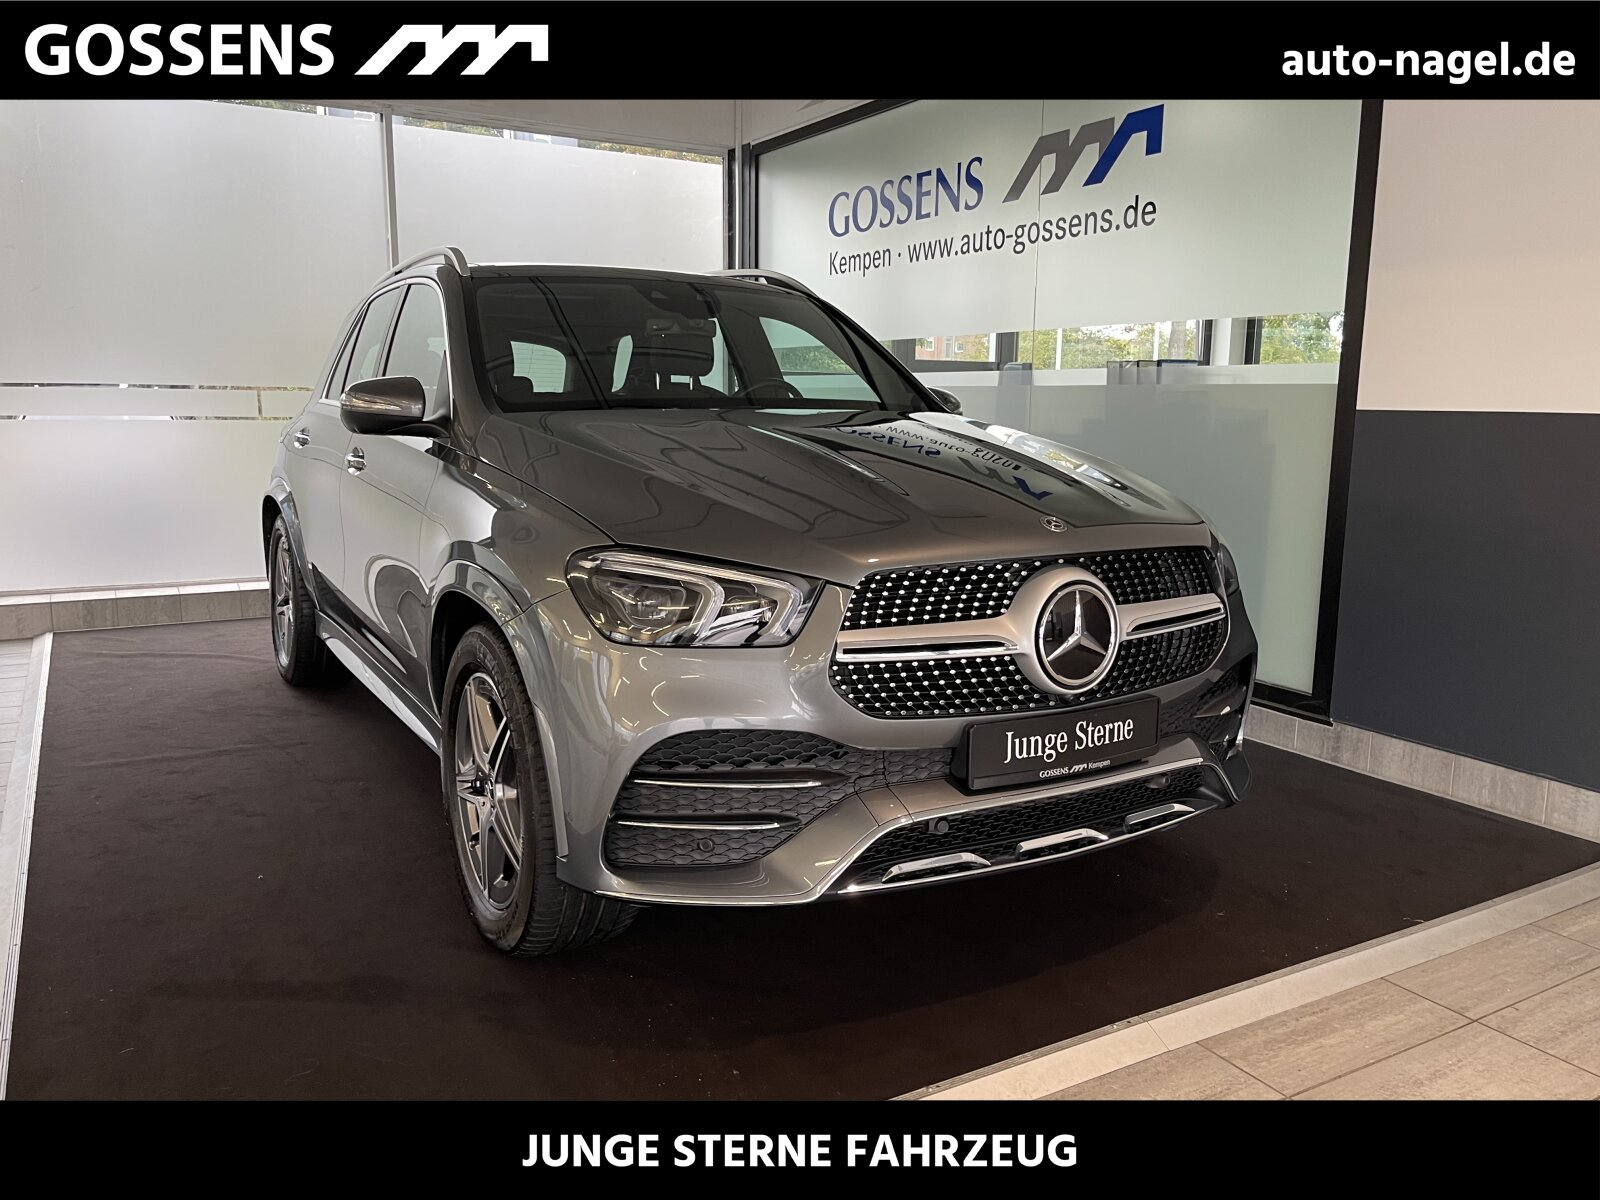 Mercedes-Benz GLE 450 4M AMG +COMAND+MULTIBEAM+AHK+PTS+360°+, Jahr 2019, Benzin